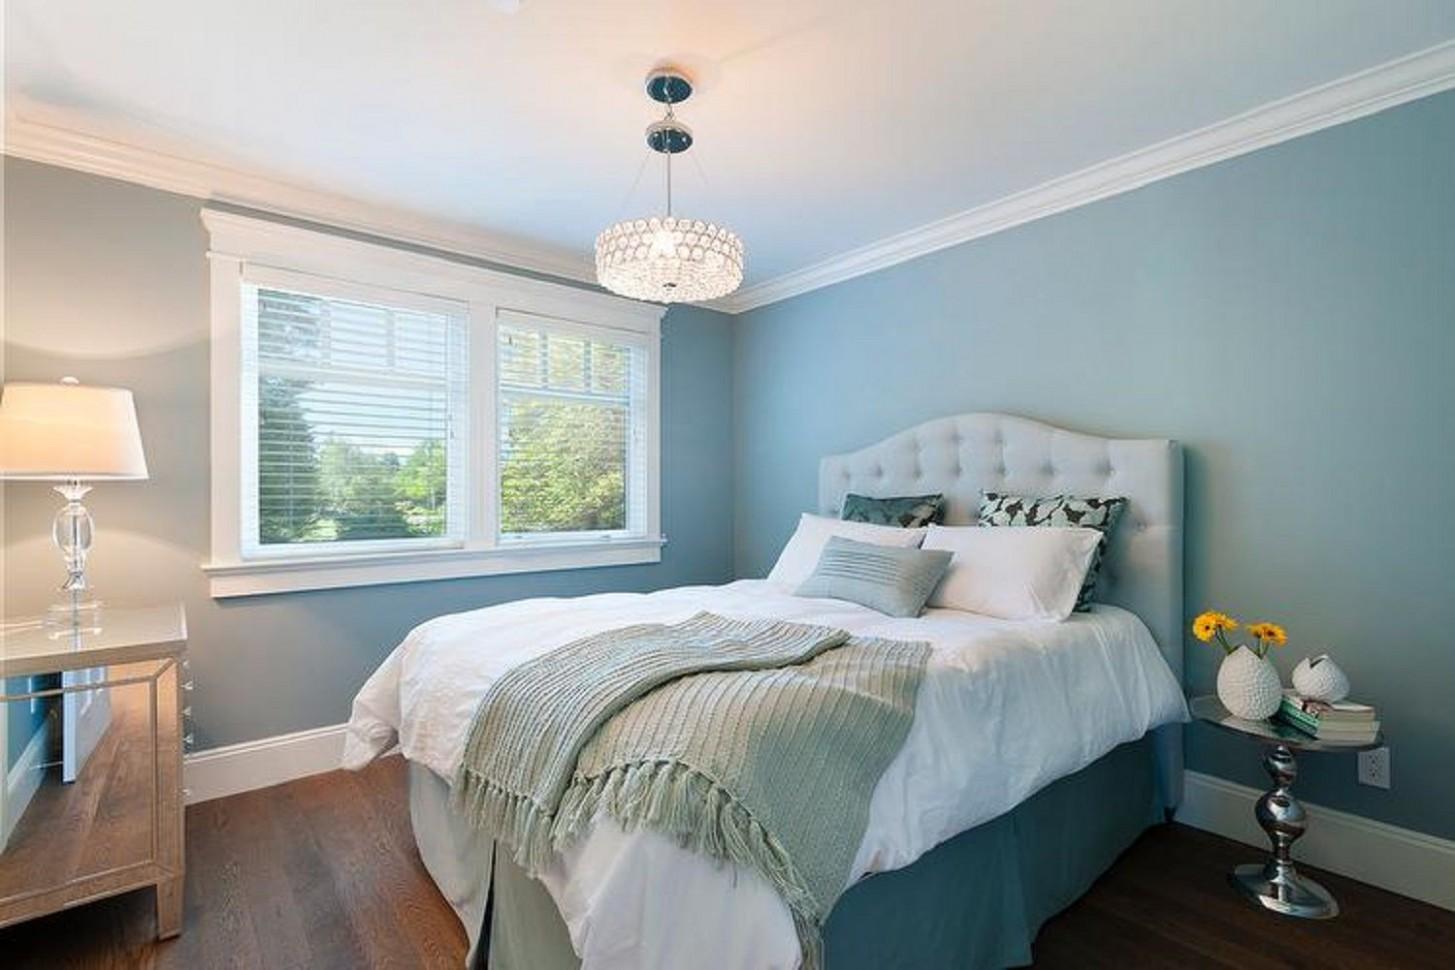 8 Stunning Blue Bedroom Ideas - Bedroom Ideas Blue